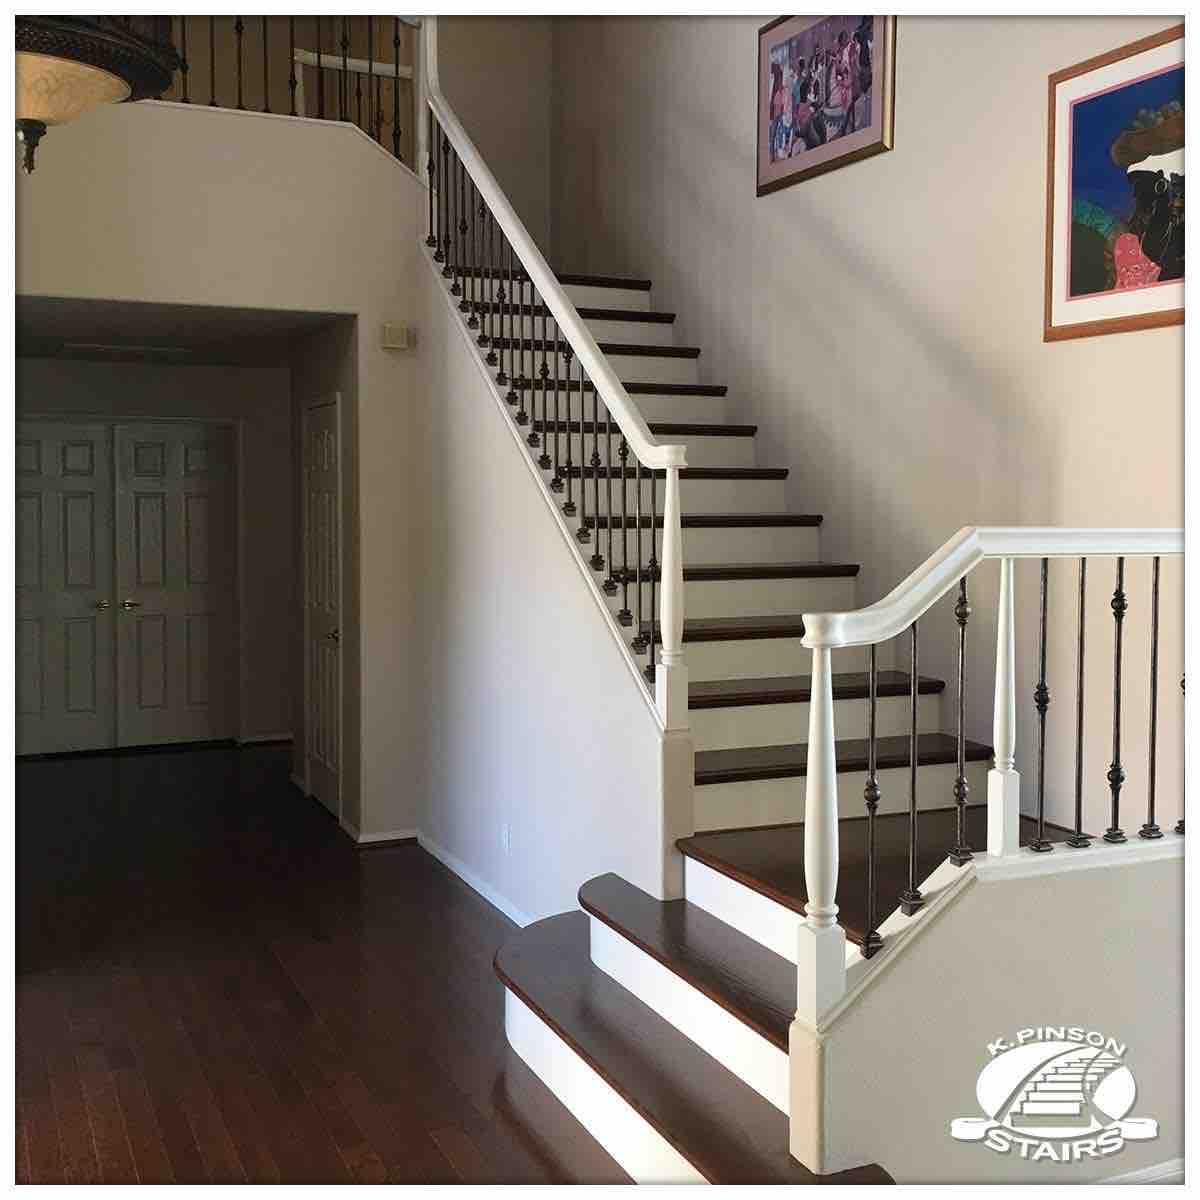 k_pinson_stairs.jpg